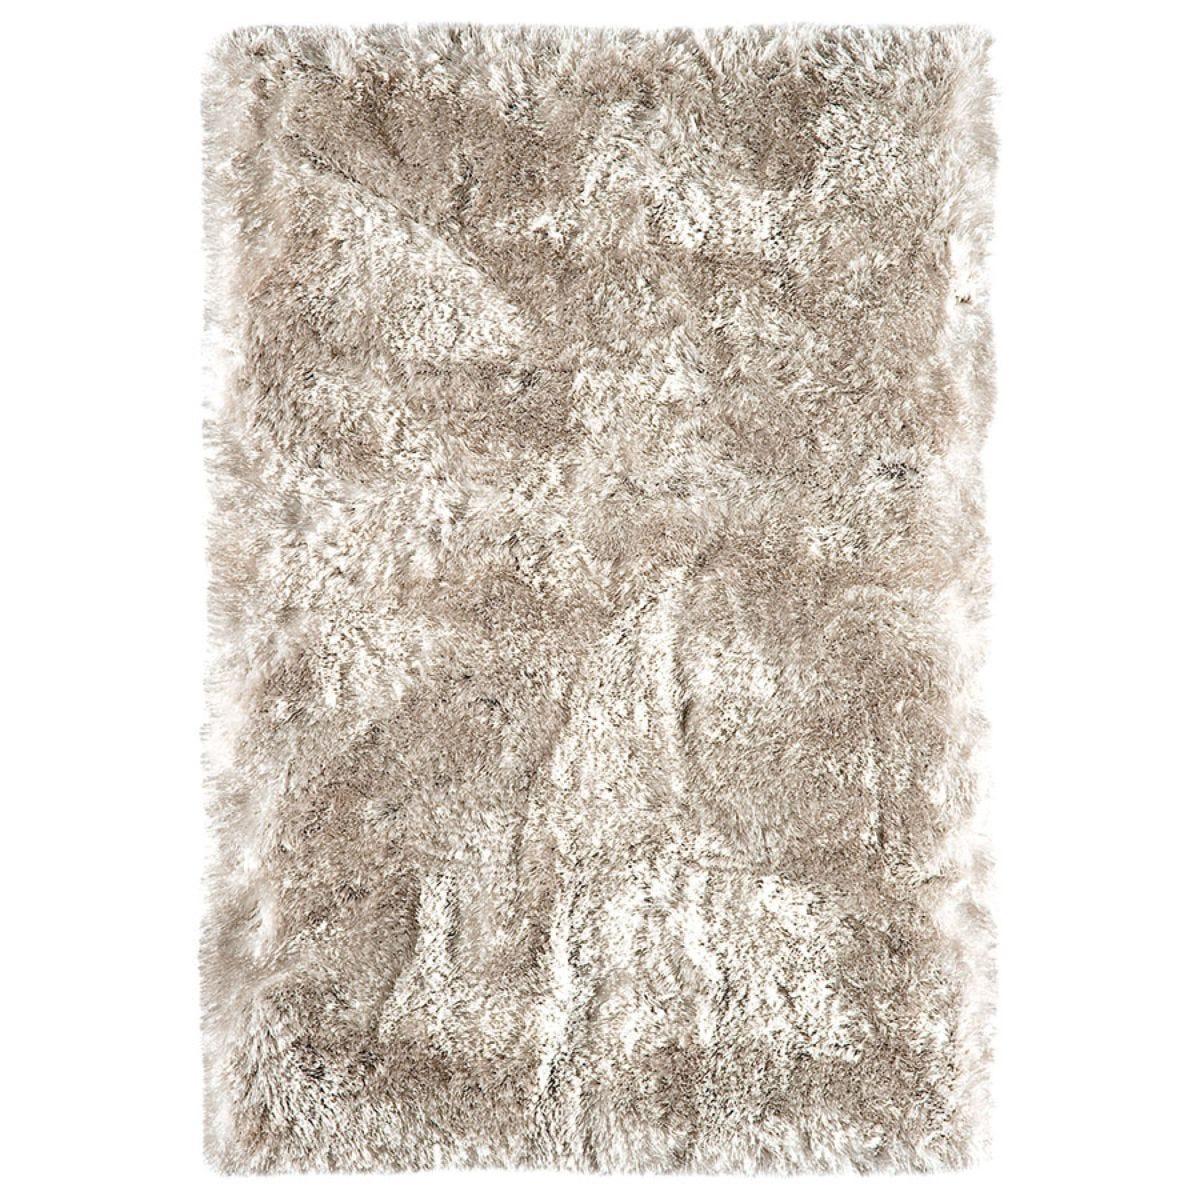 Asiatic Plush Shaggy Rug, 70 x 140cm - Sand